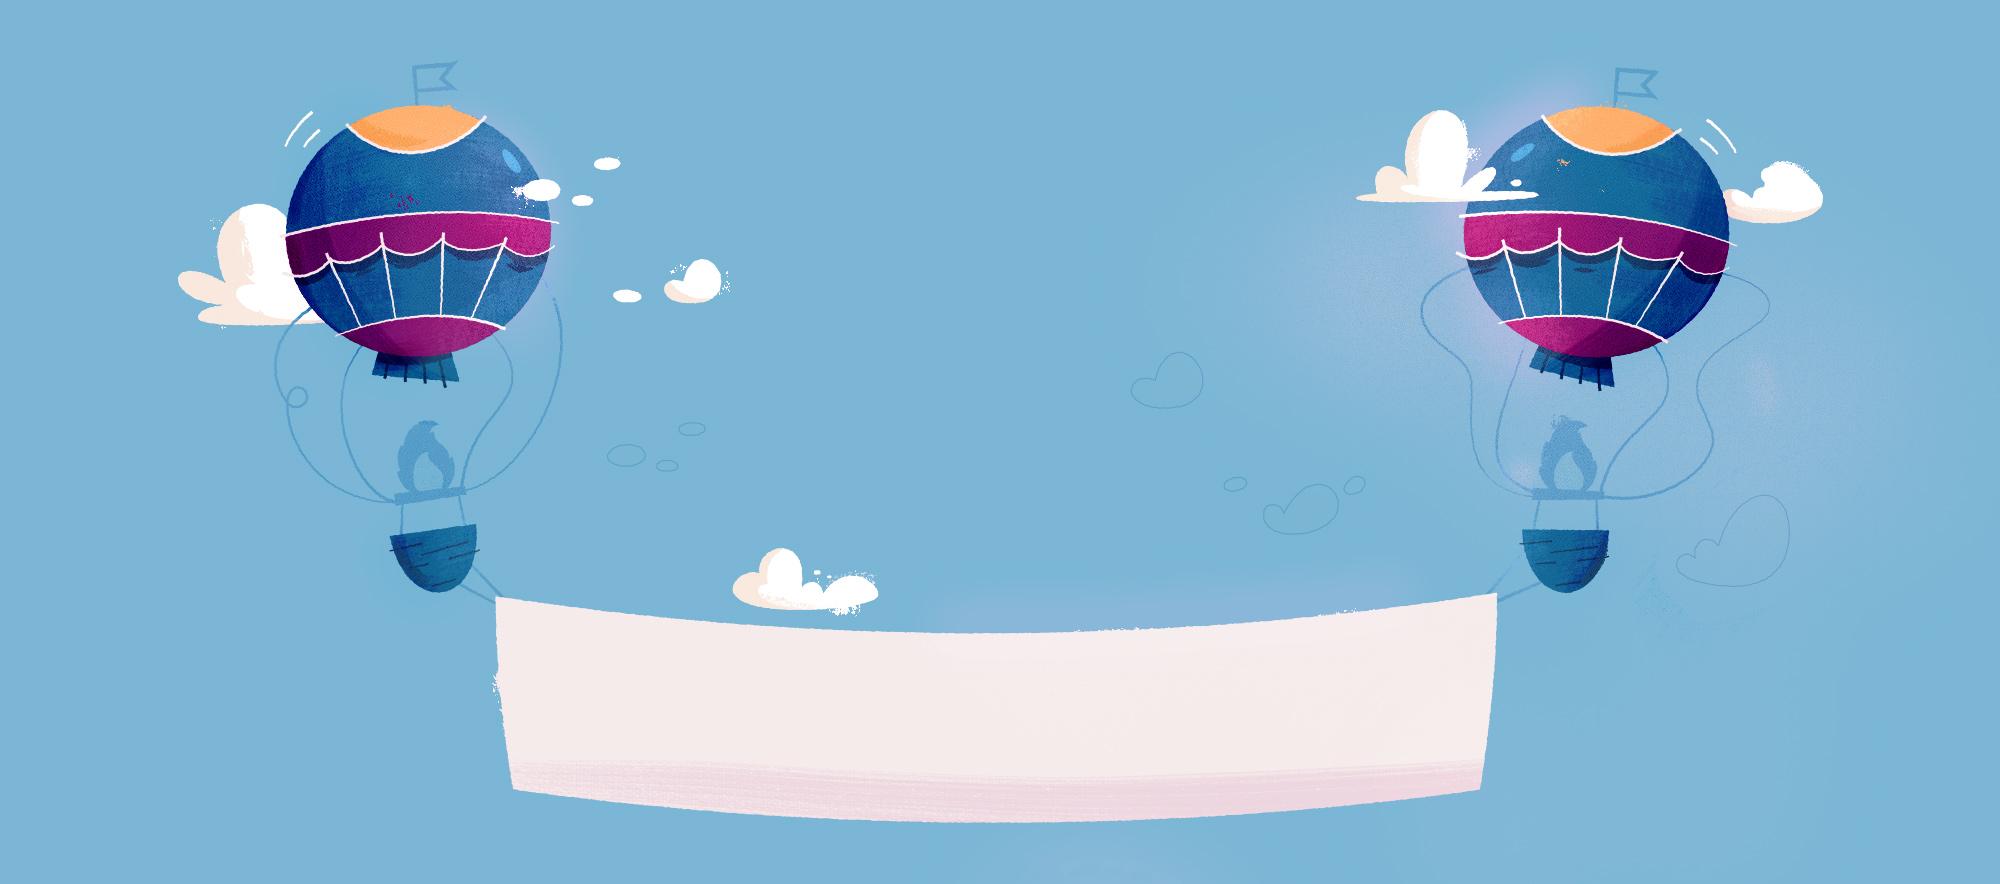 sf-balloons-01.jpg